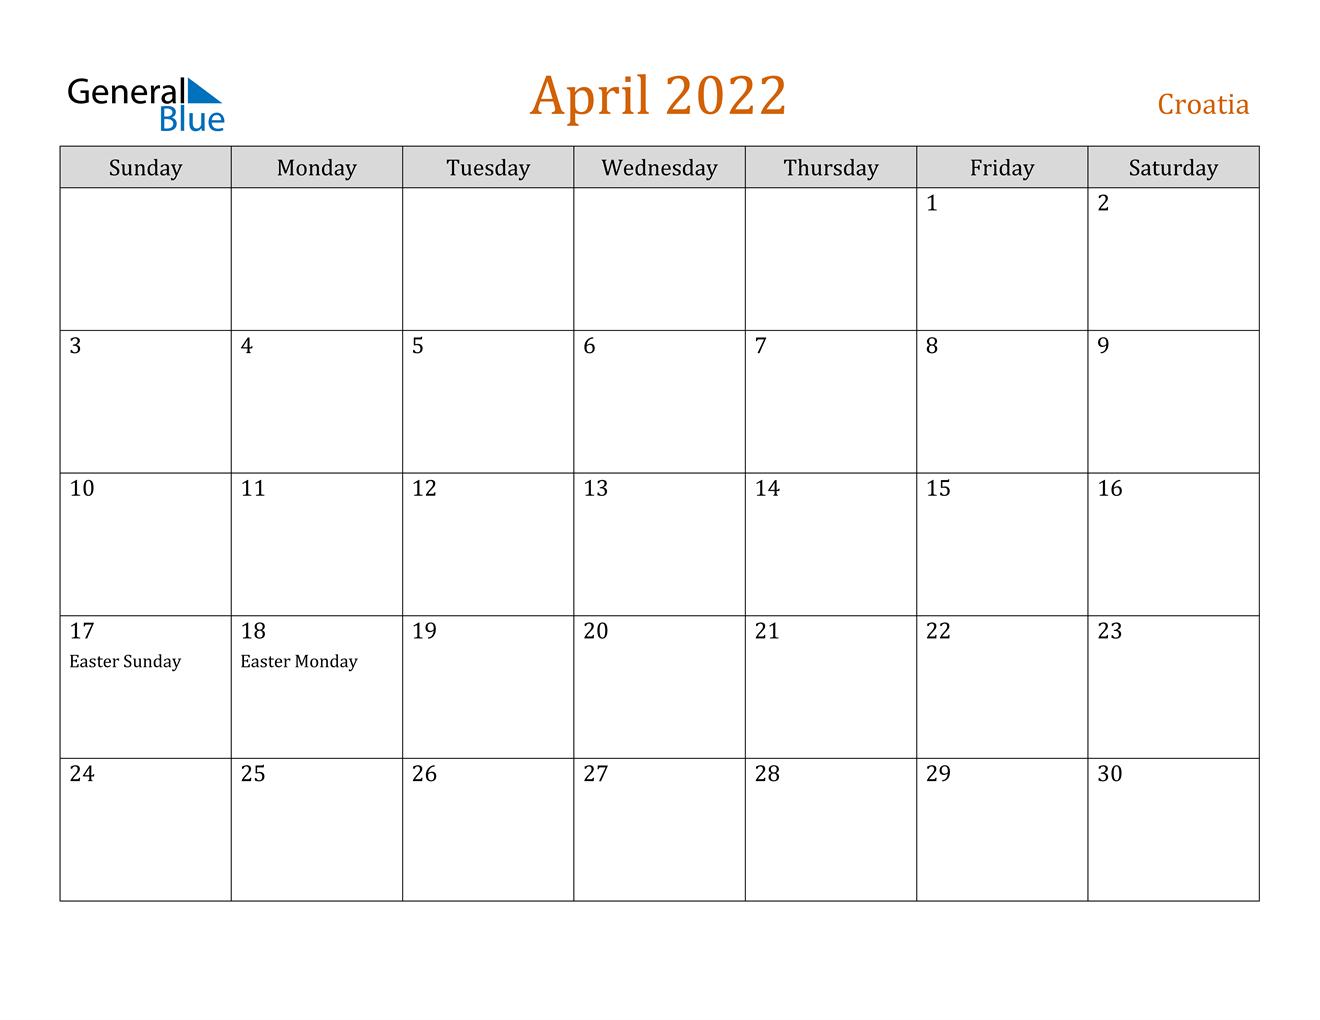 April 2022 Calendar - Croatia with Printable April 2022 Calendar Template Free